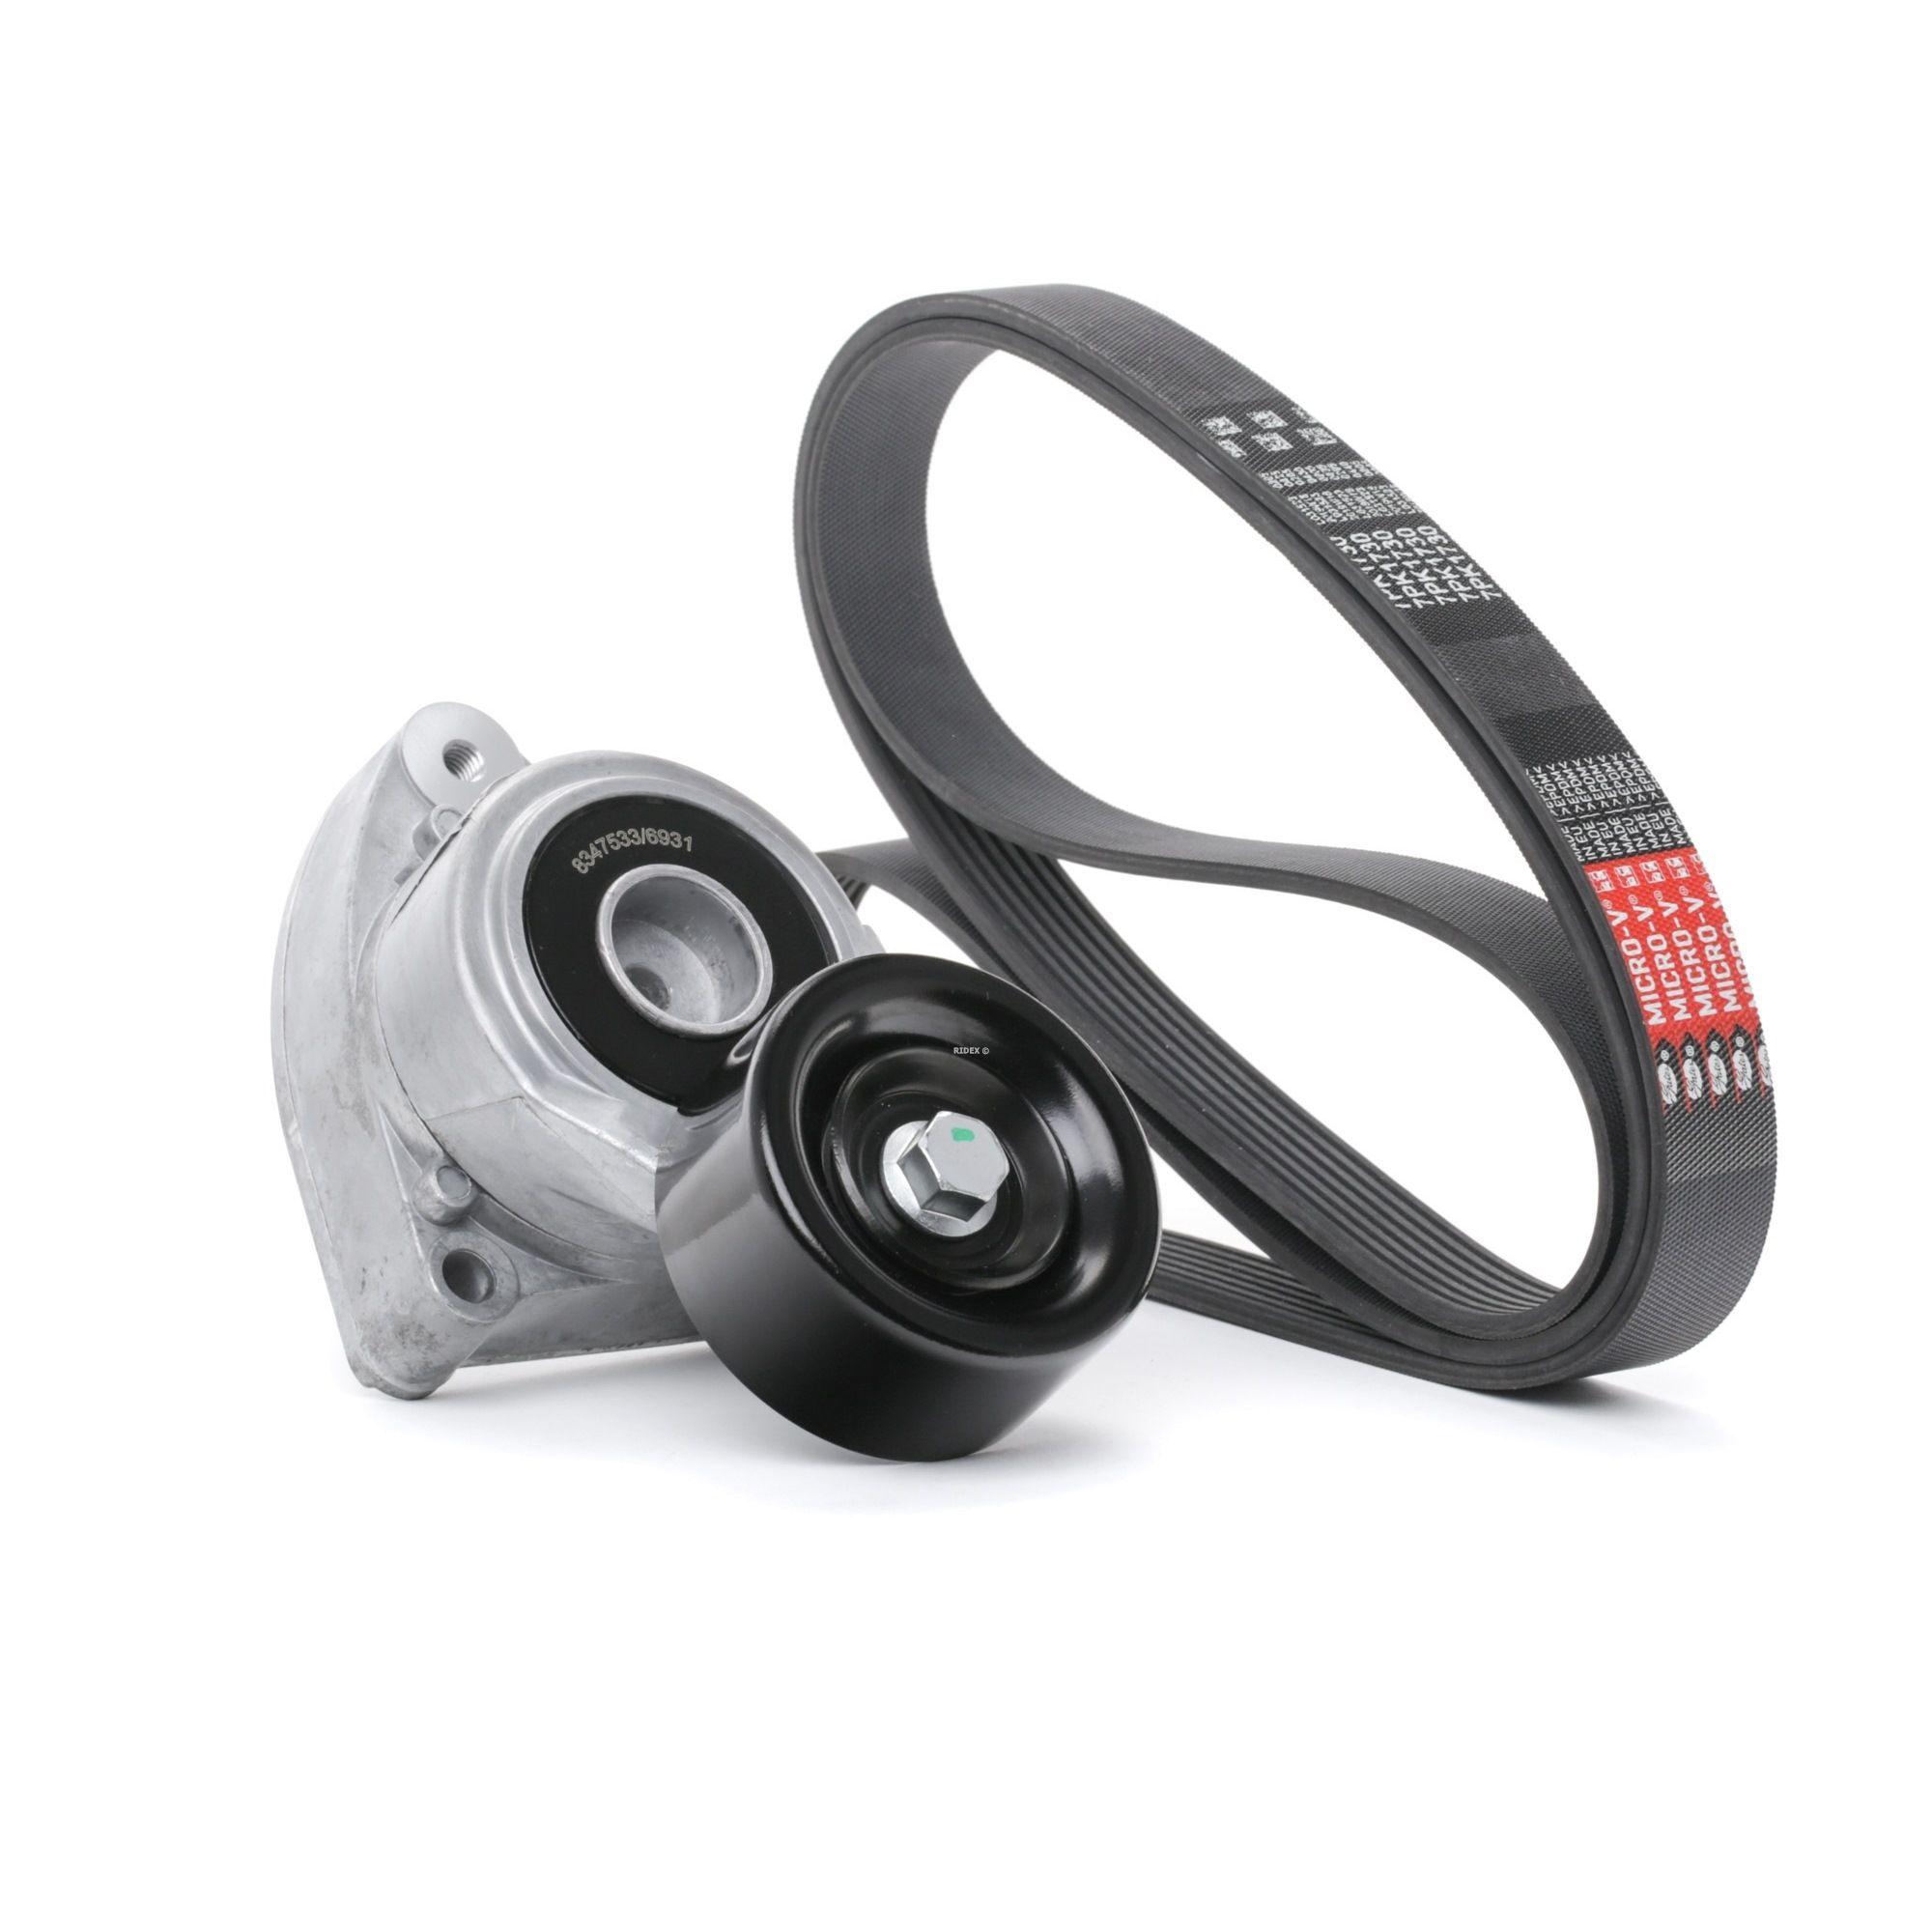 V-Ribbed Belt Set RIDEX 542R0324 rating